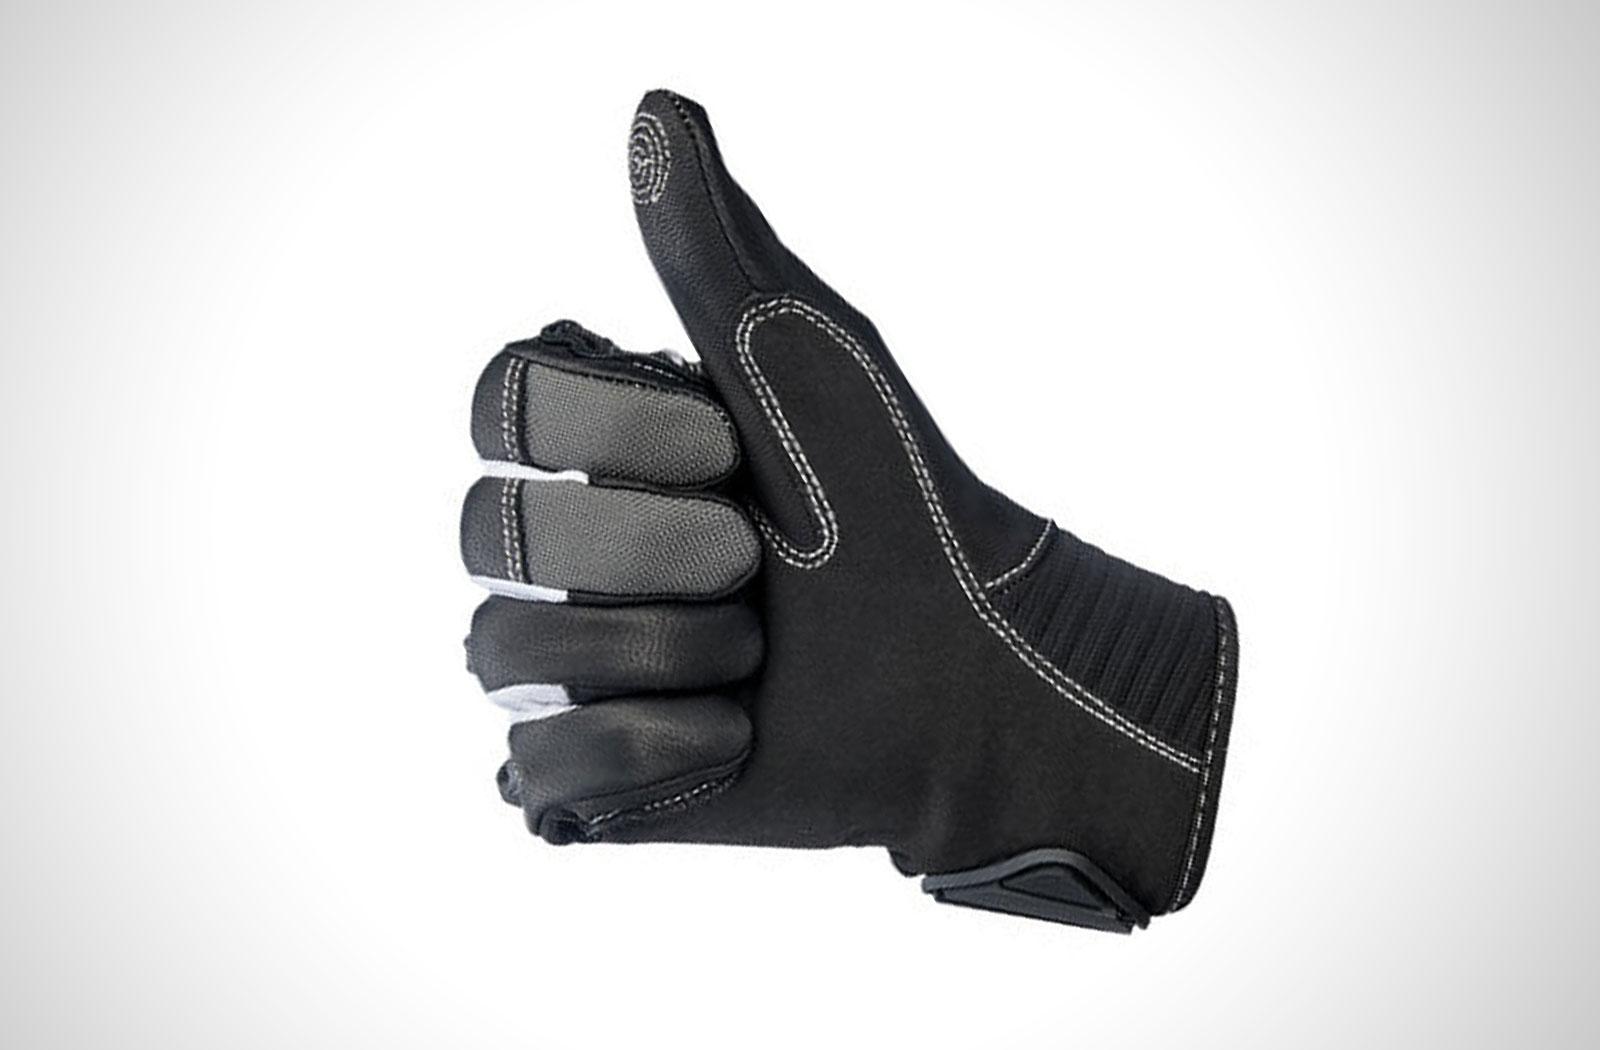 Biltwell Bridgeport Gloves